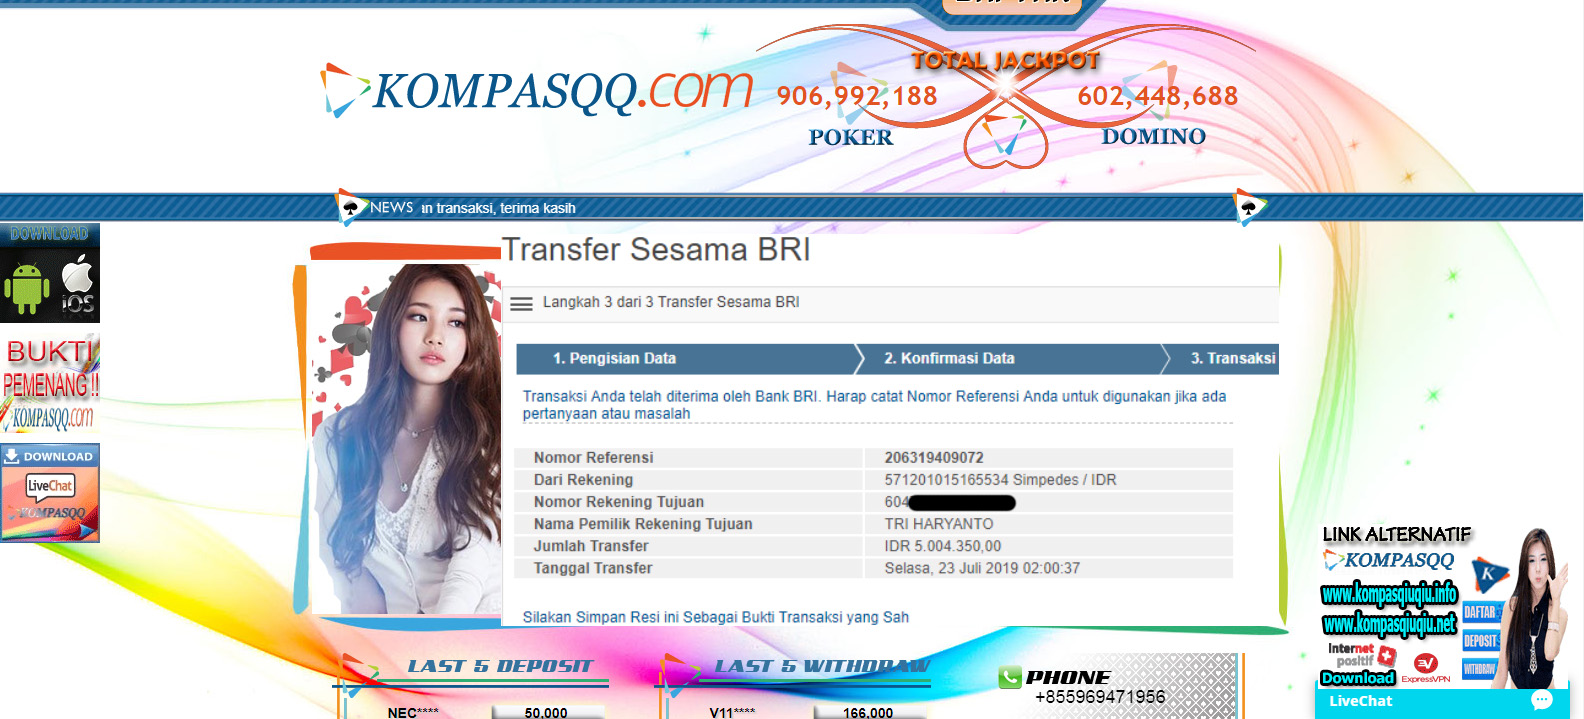 Bukti Kemenangan Kompas99 Bukti Transfer Kemenangan Kompasqq Rp 5 004 350